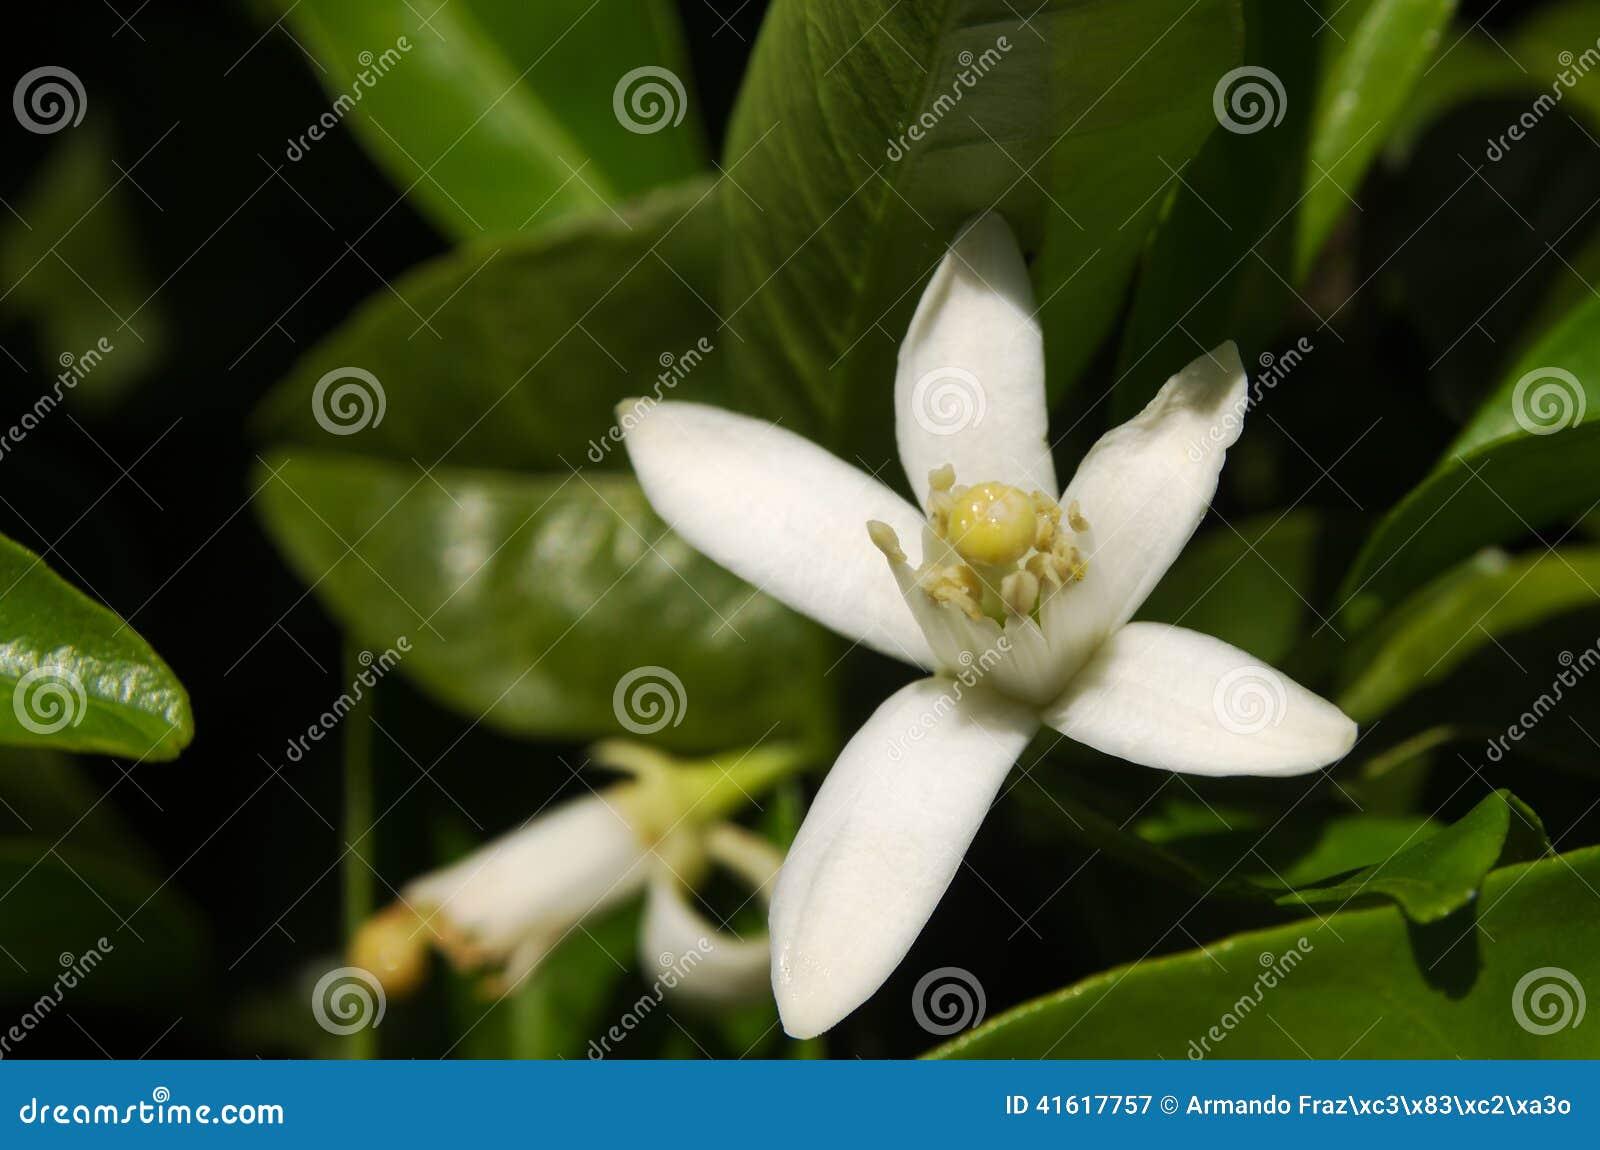 Orange tree flower - Citrus x sinensis